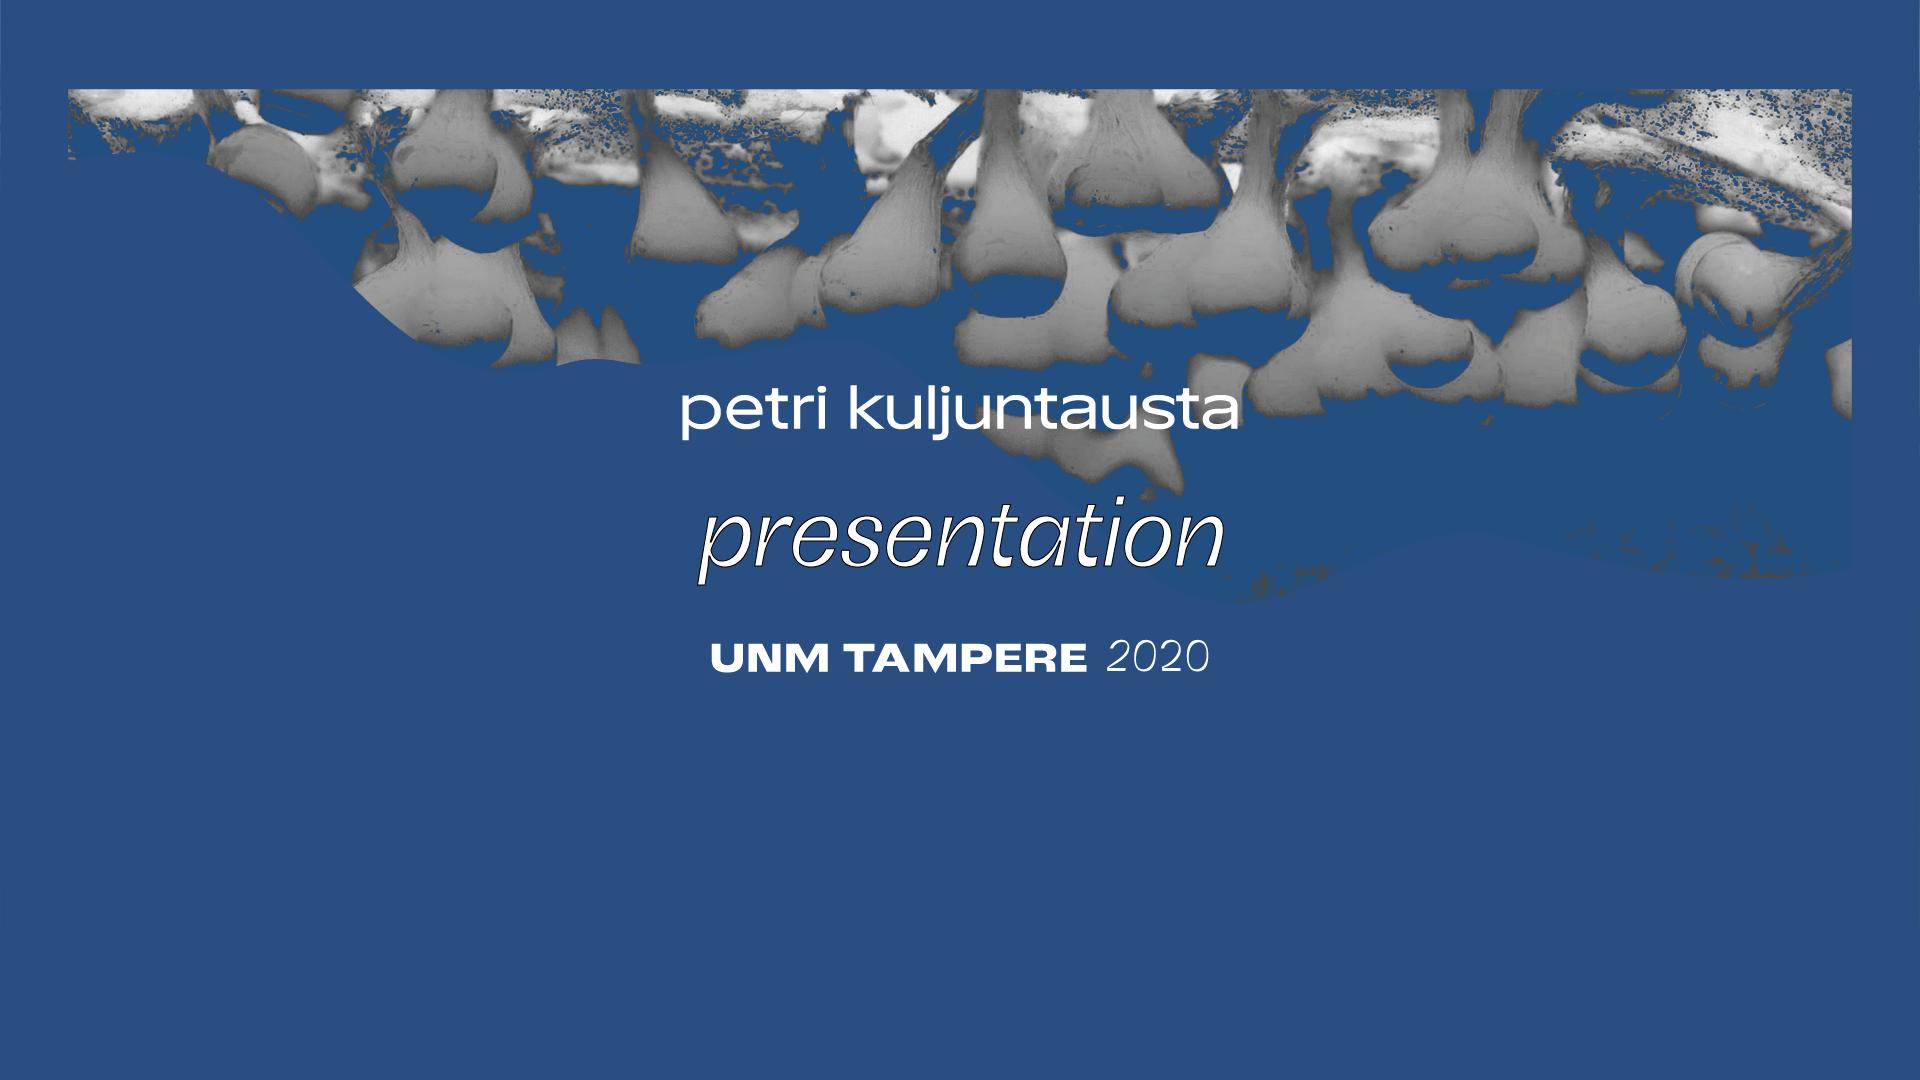 UNM 2020: Esitelmä #1 – Petri Kuljuntausta